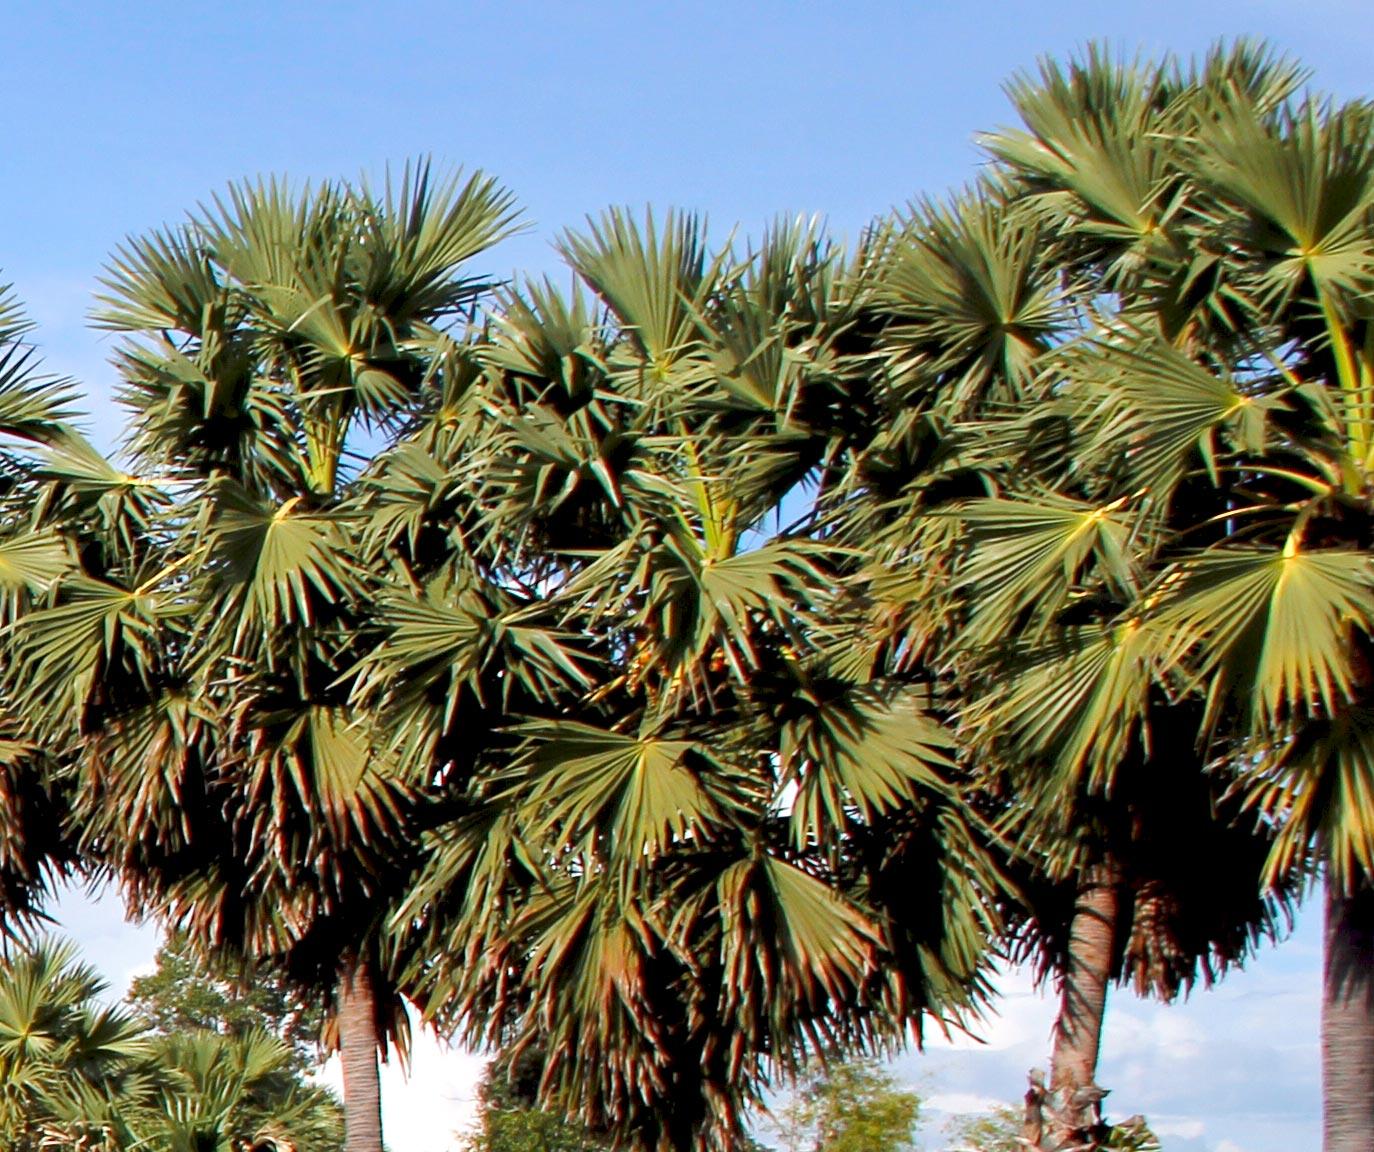 Group sugar palm trees